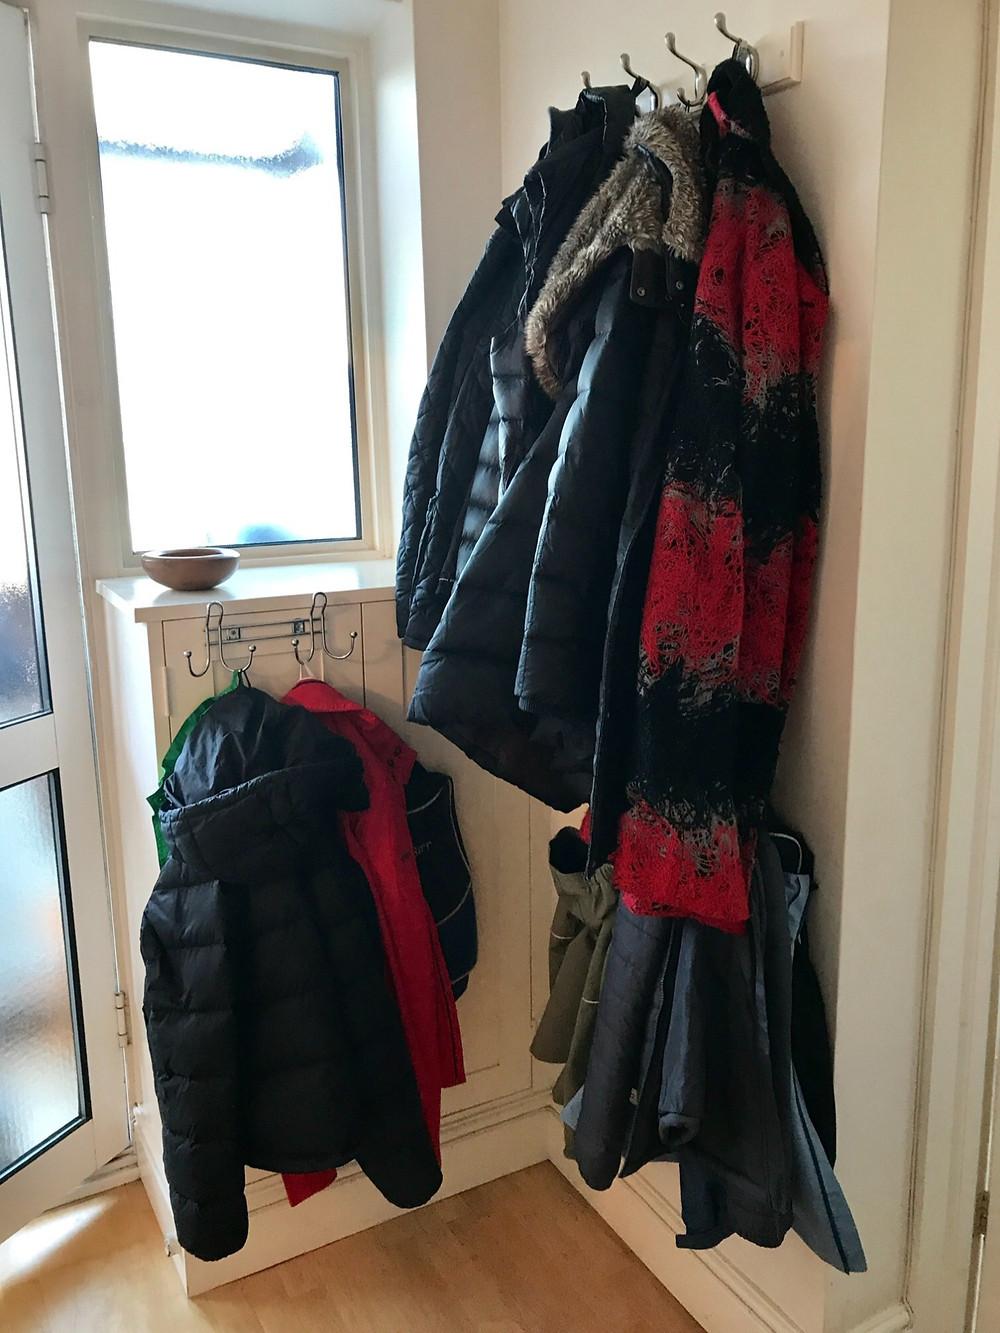 Coats hanging in hallway, entrance storage